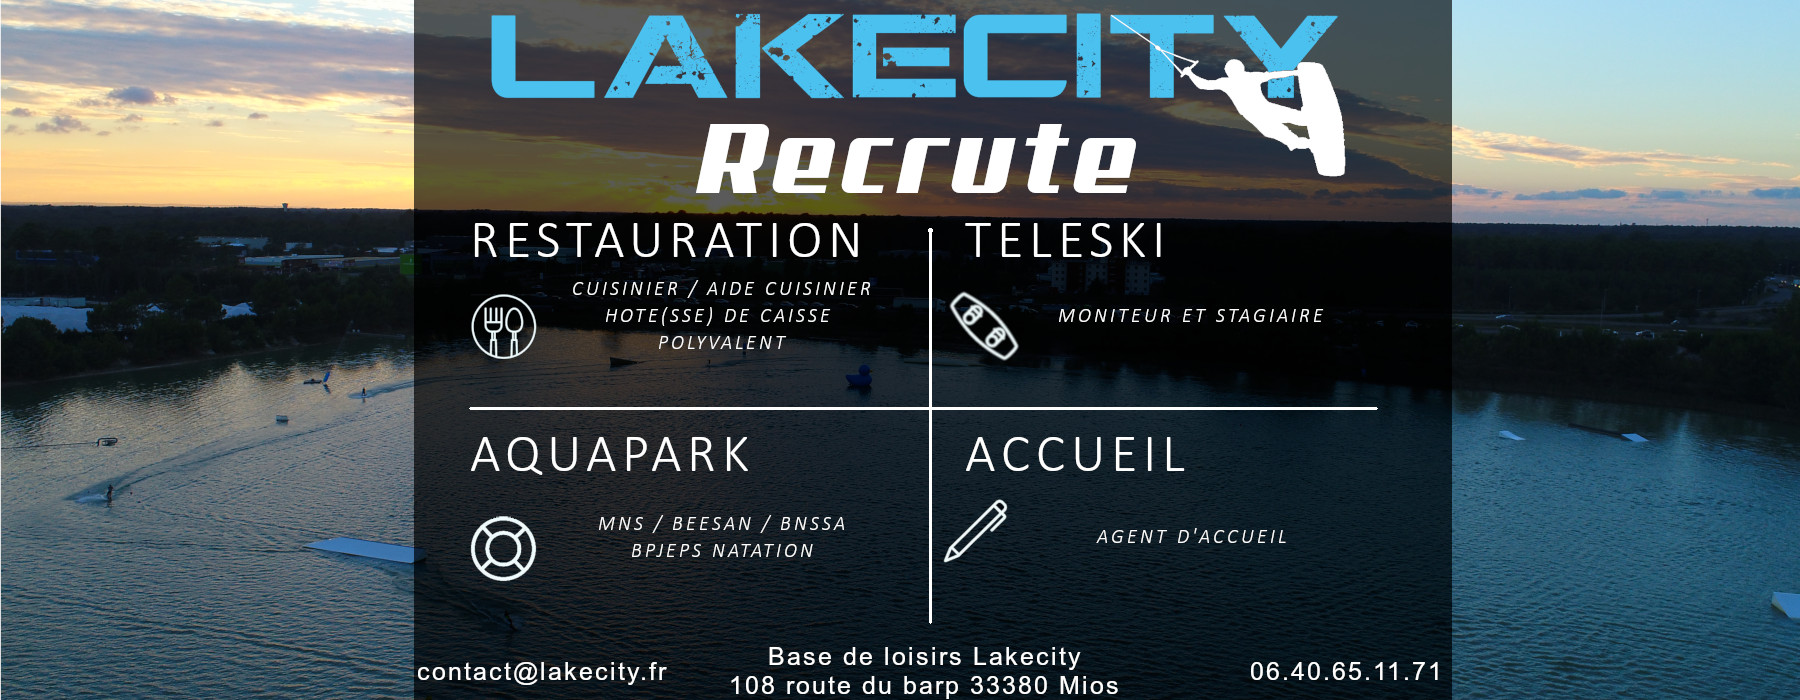 Recrutement, Lakecity 33, wakeboard, aquapark